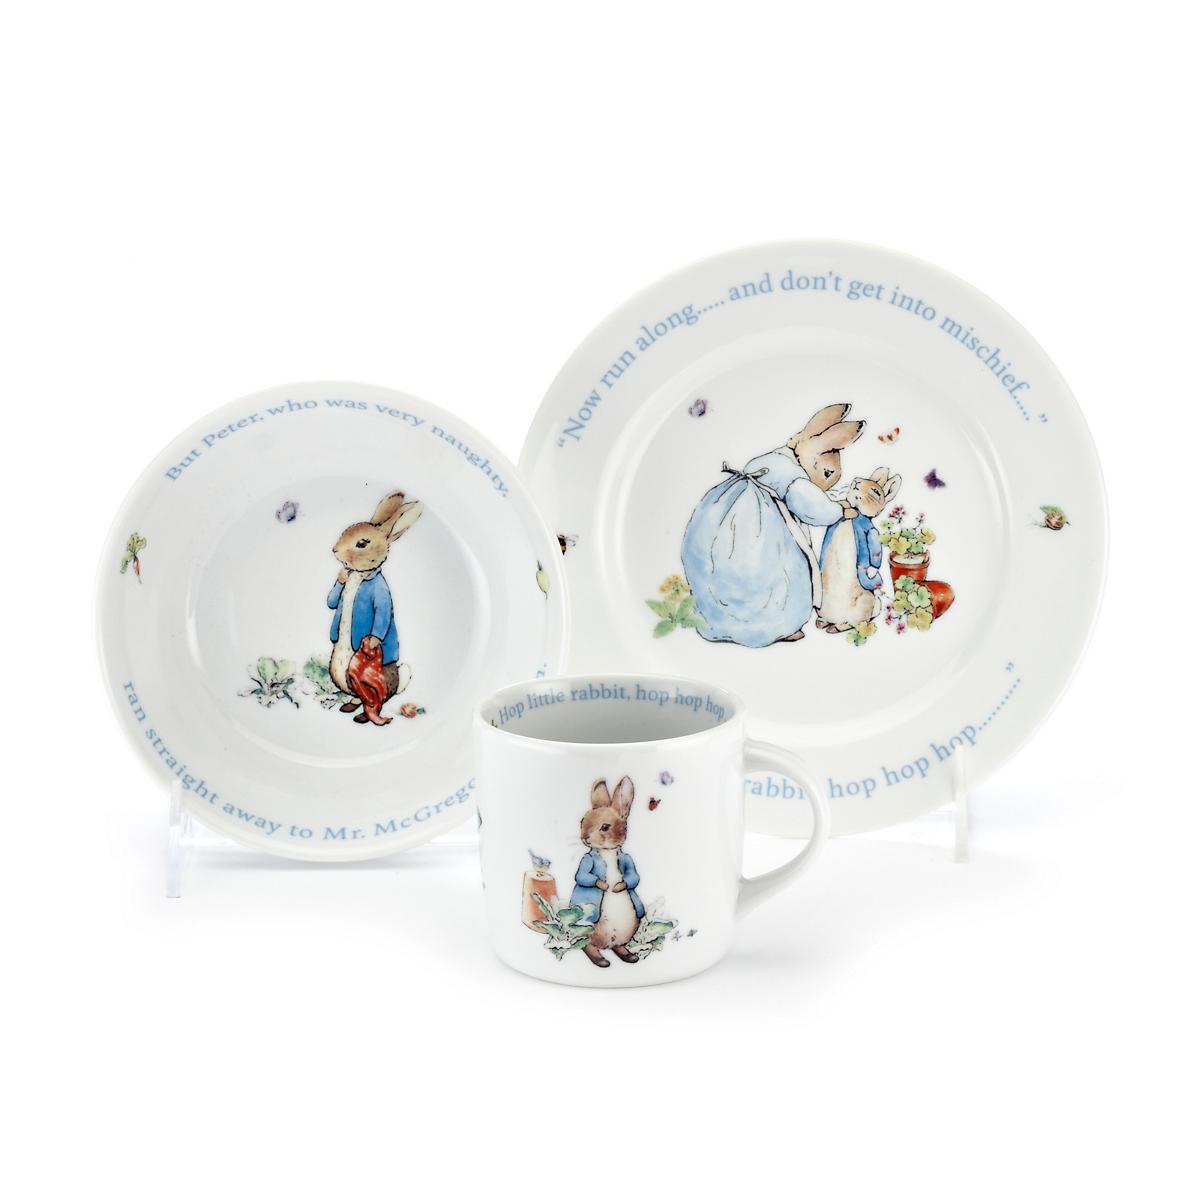 Wedgwood Peter Rabbit Childrenu0027s Set Blue  sc 1 st  Gumpu0027s & Wedgwood Peter Rabbit Childrenu0027s Set Blue | Gumpu0027s